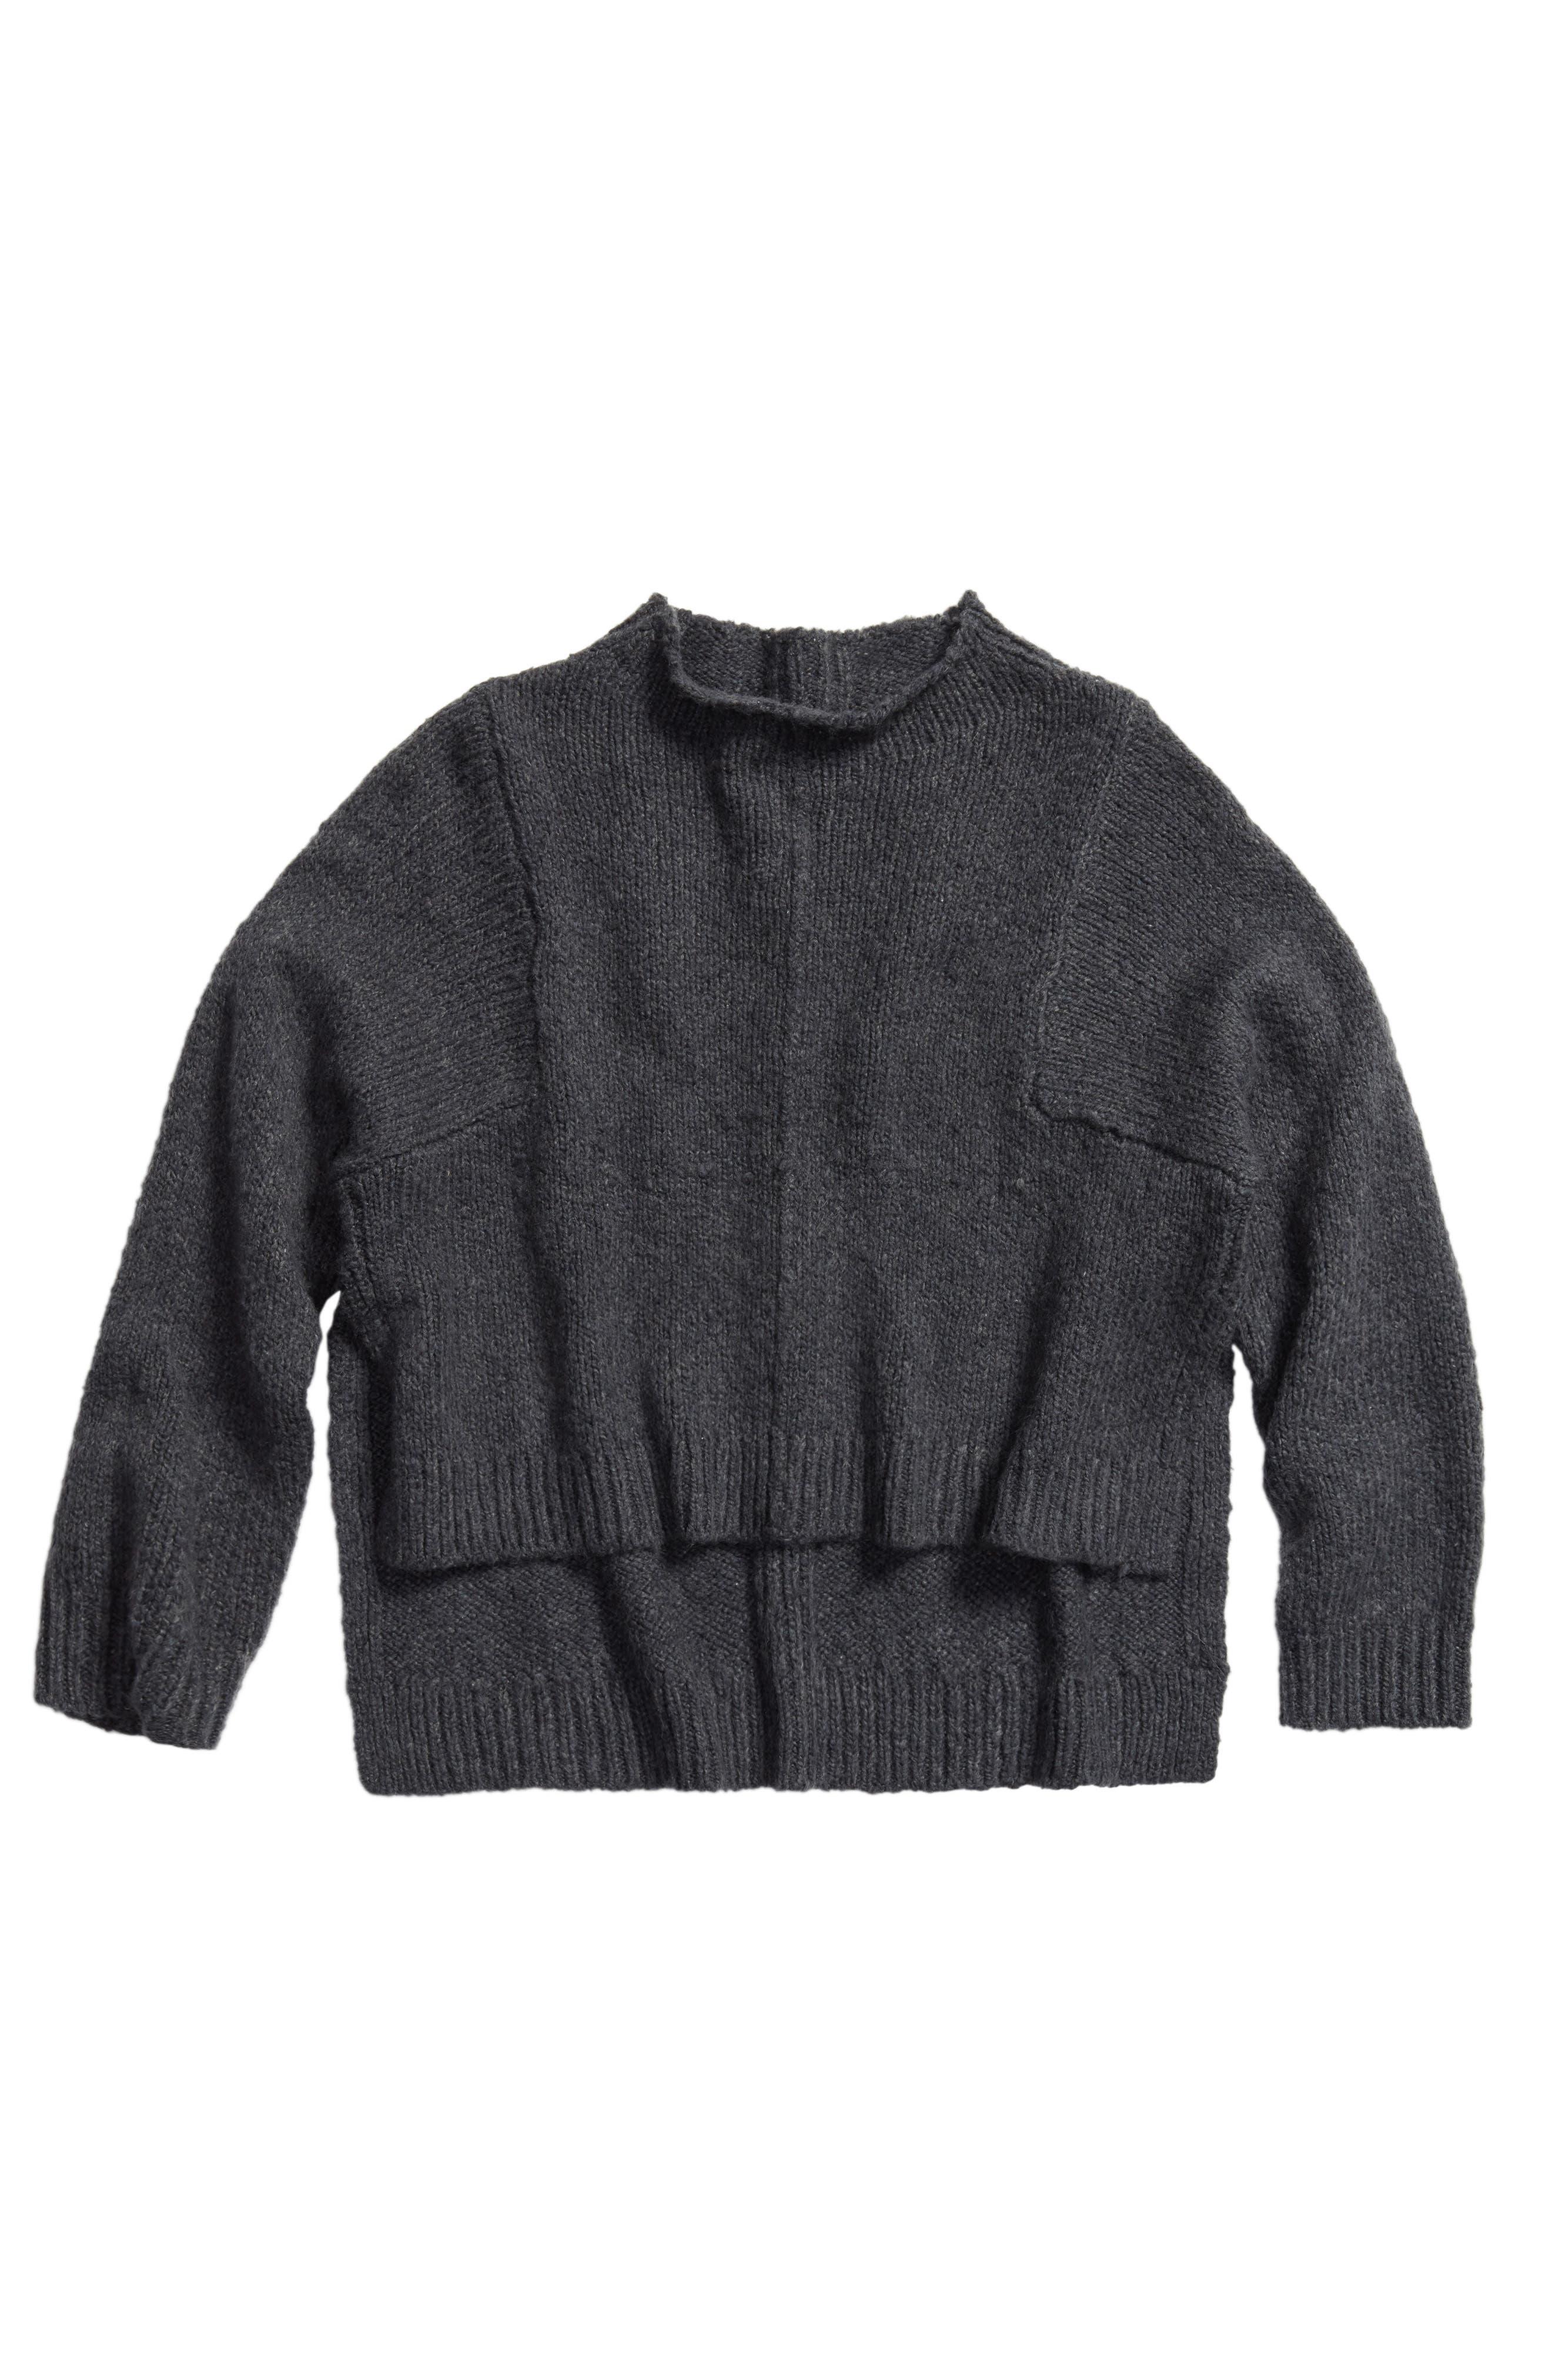 TREASURE & BOND,                             Funnel Neck Sweater,                             Main thumbnail 1, color,                             021